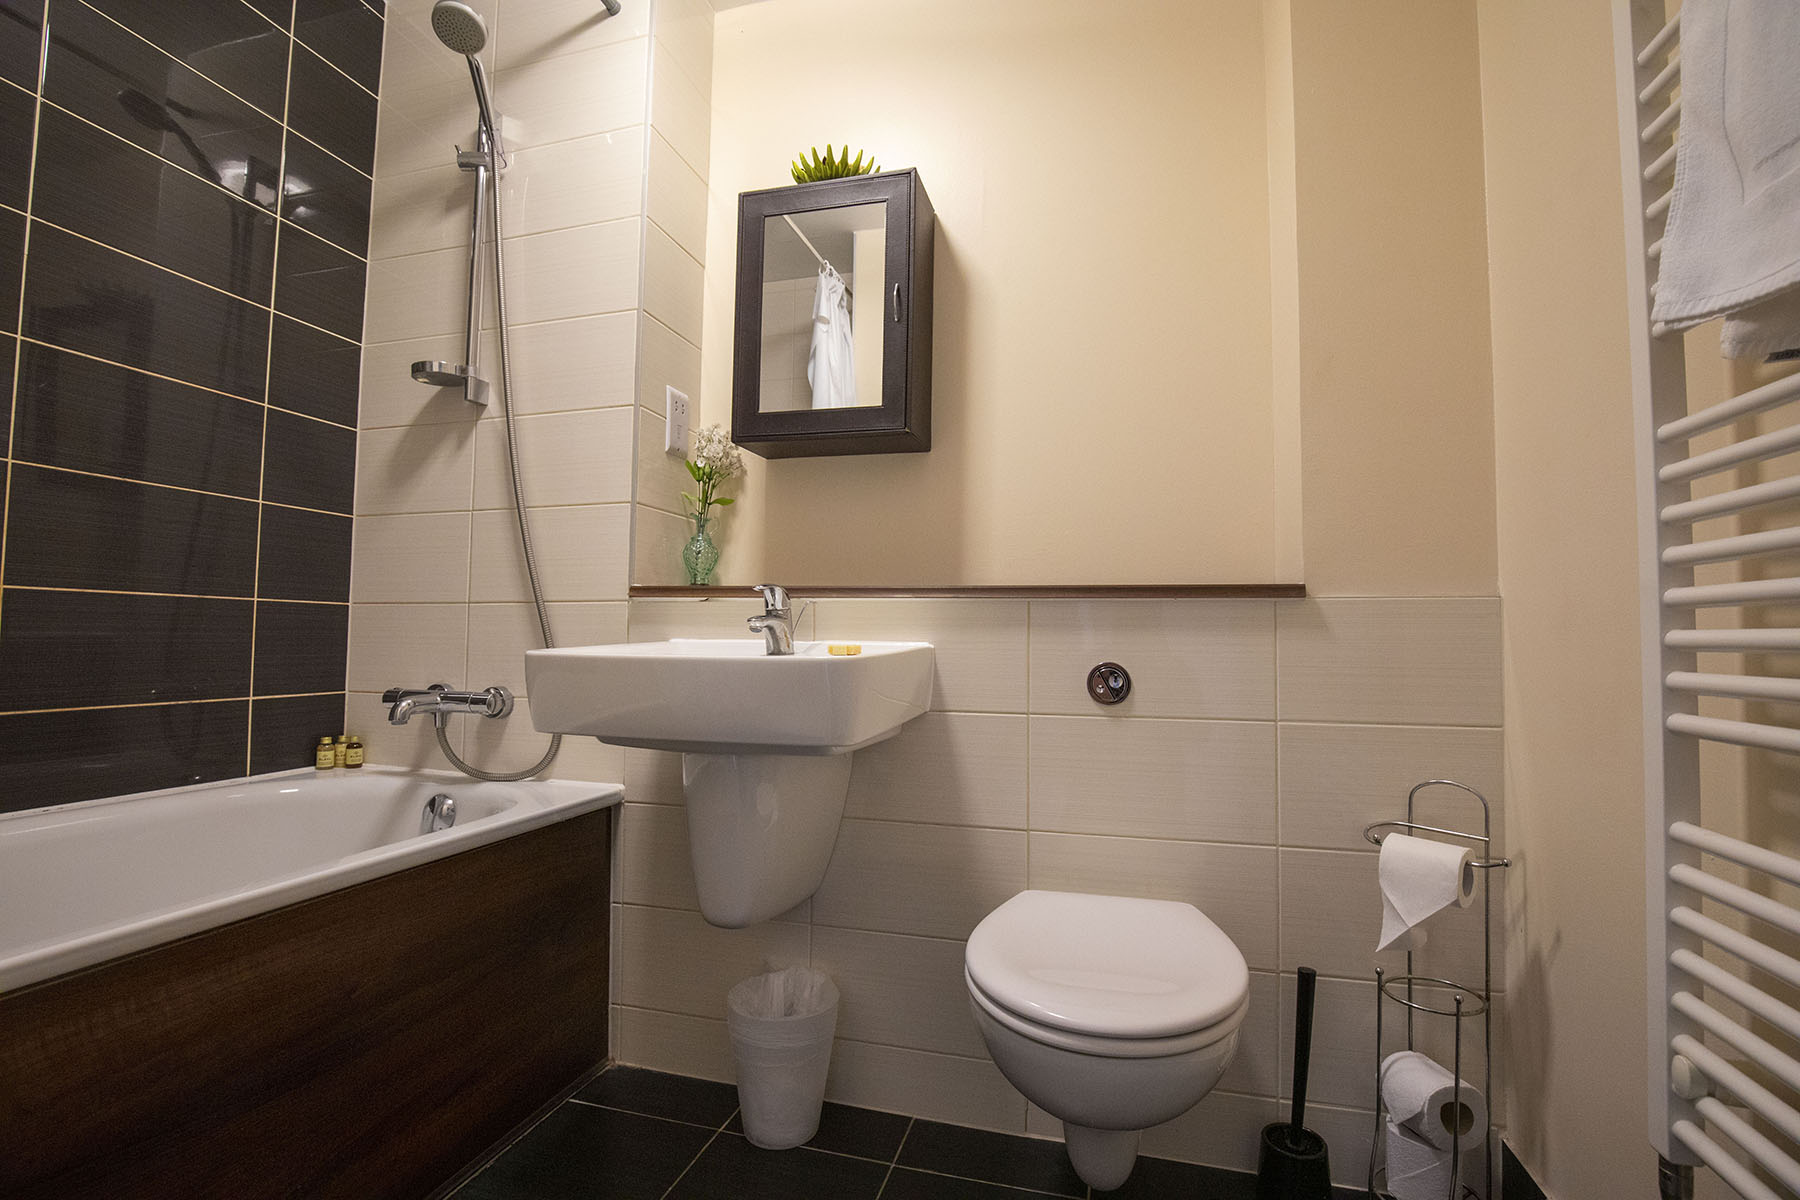 Bathroom at Flexi-Let Skyline Plaza Apartments, Centre, Basingstoke - Citybase Apartments